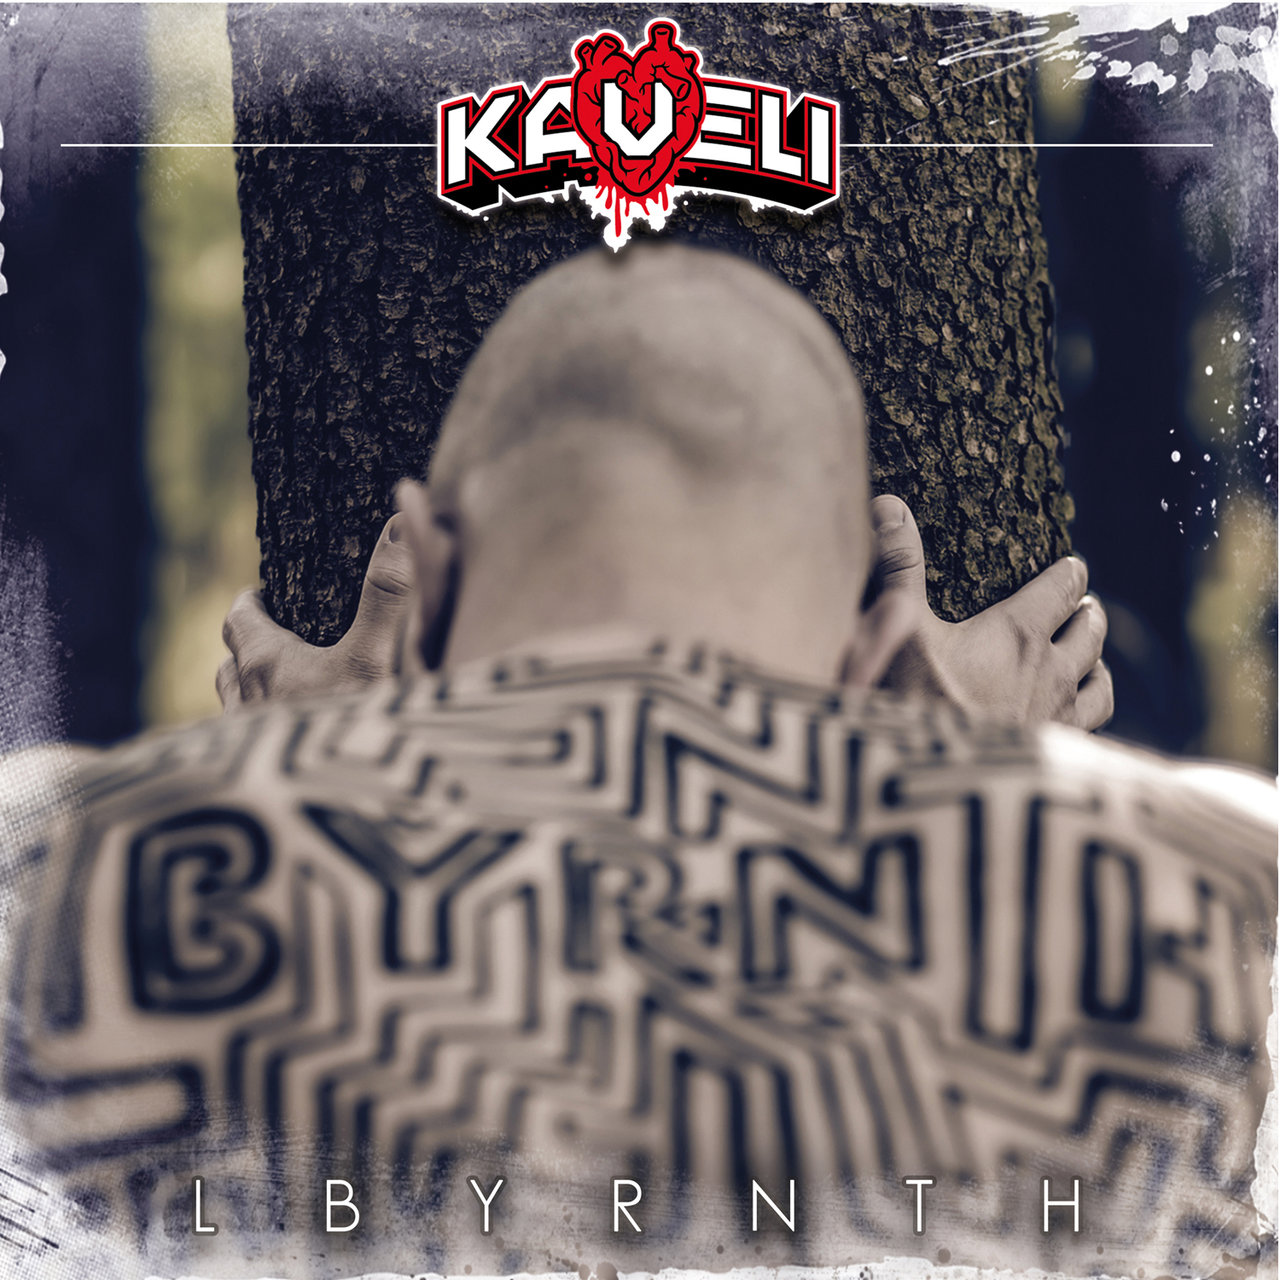 TIDAL: Listen to Kopfnicker Sound by Kaveli on TIDAL